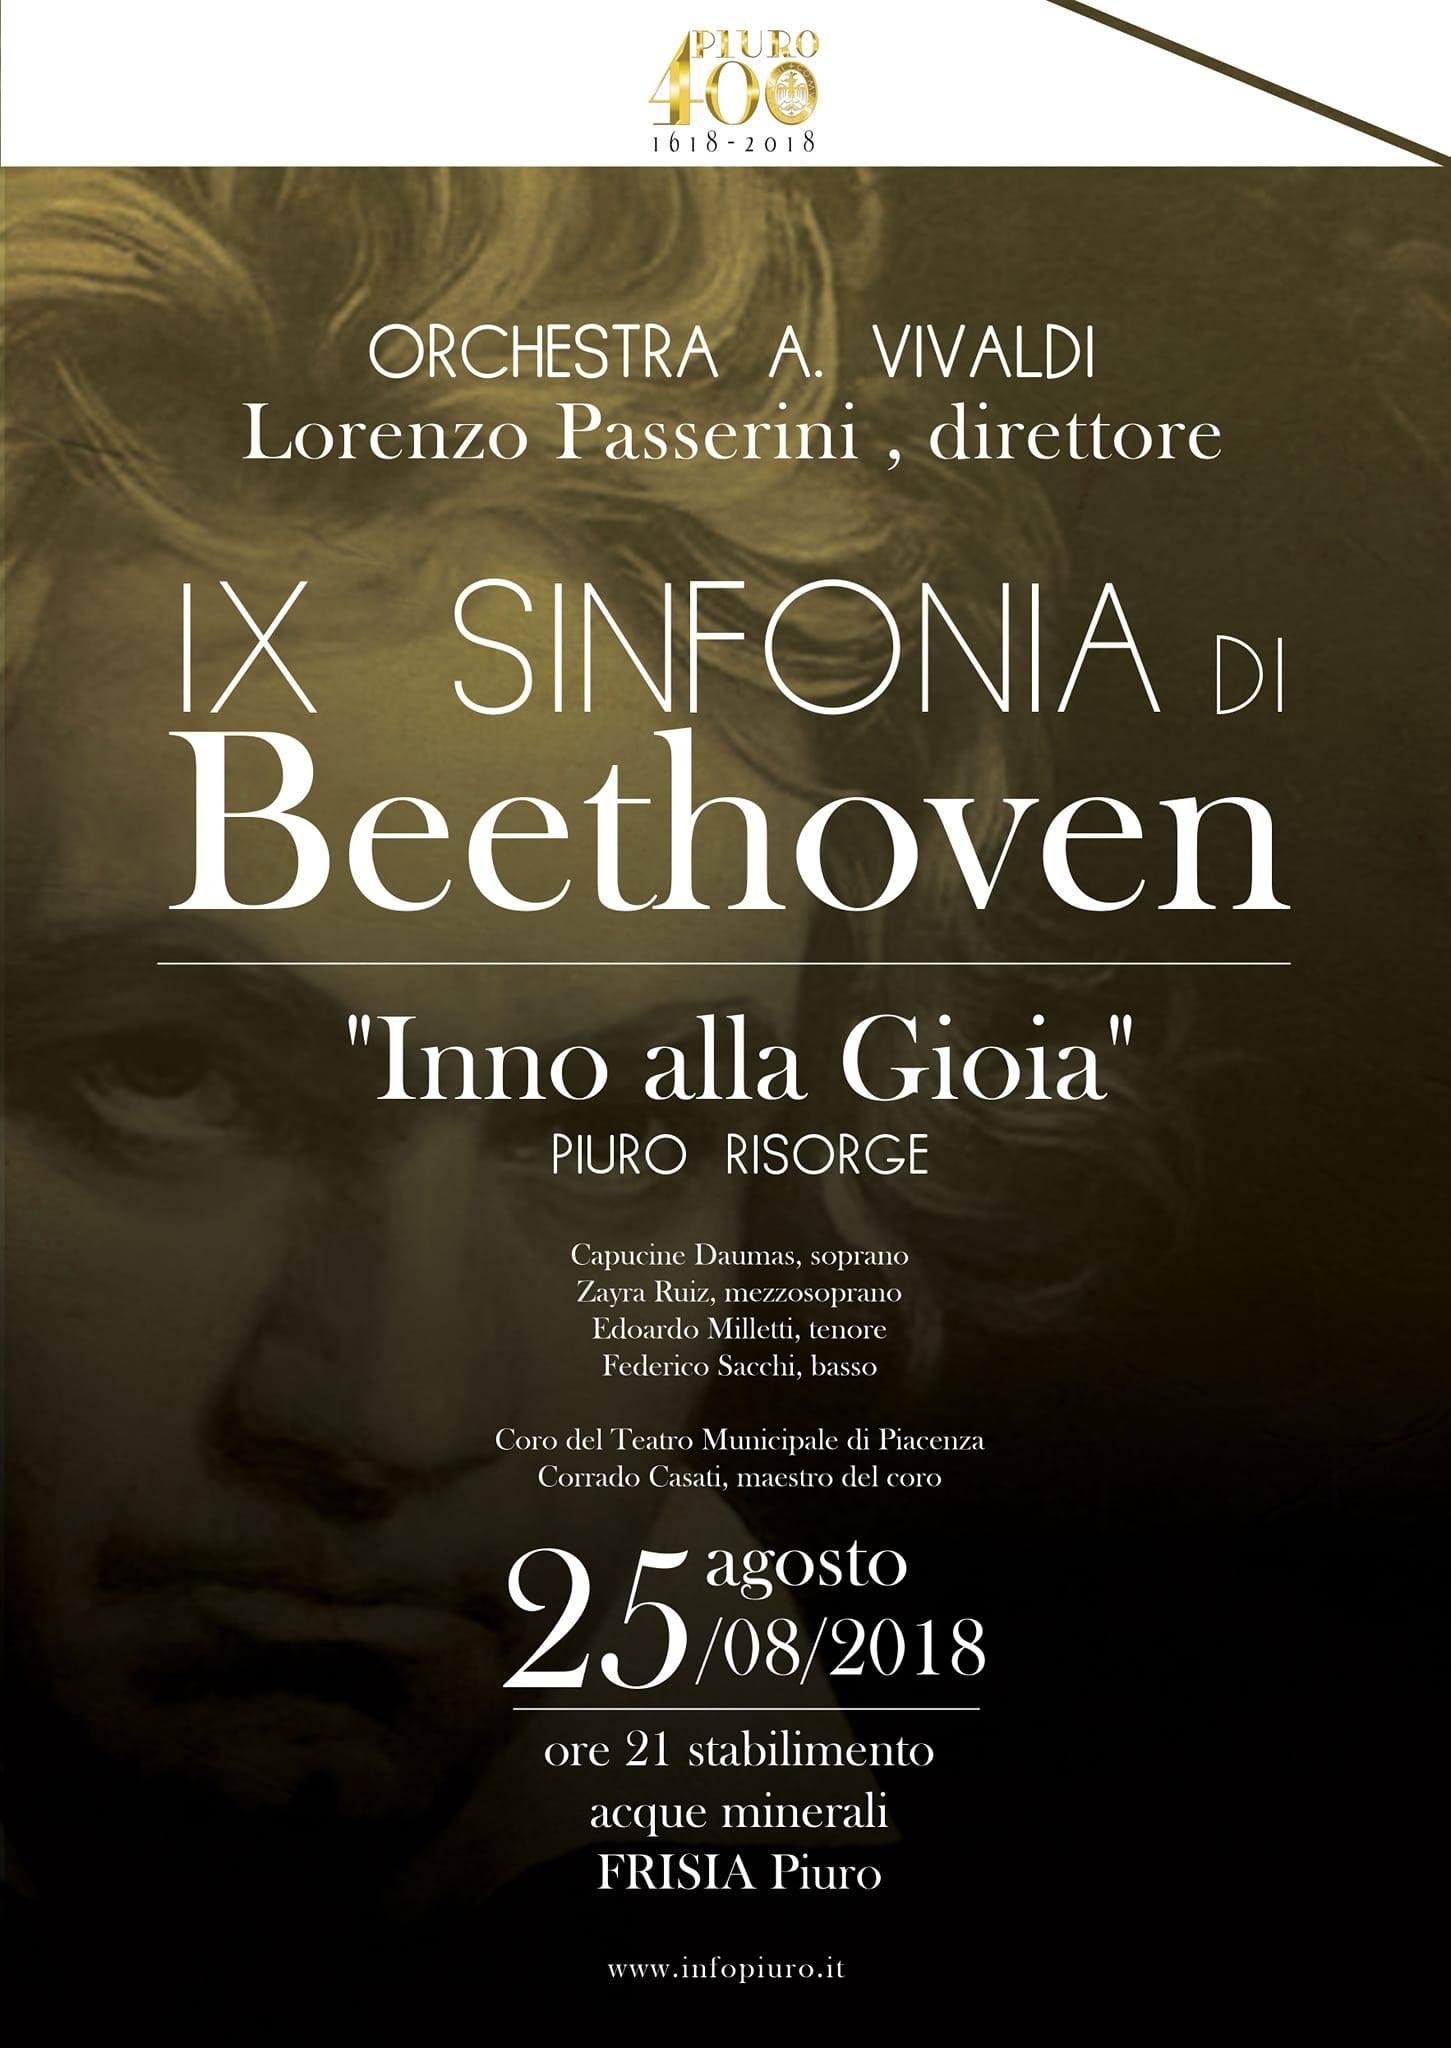 IXBeethoven-Orchestra-Vivaldi